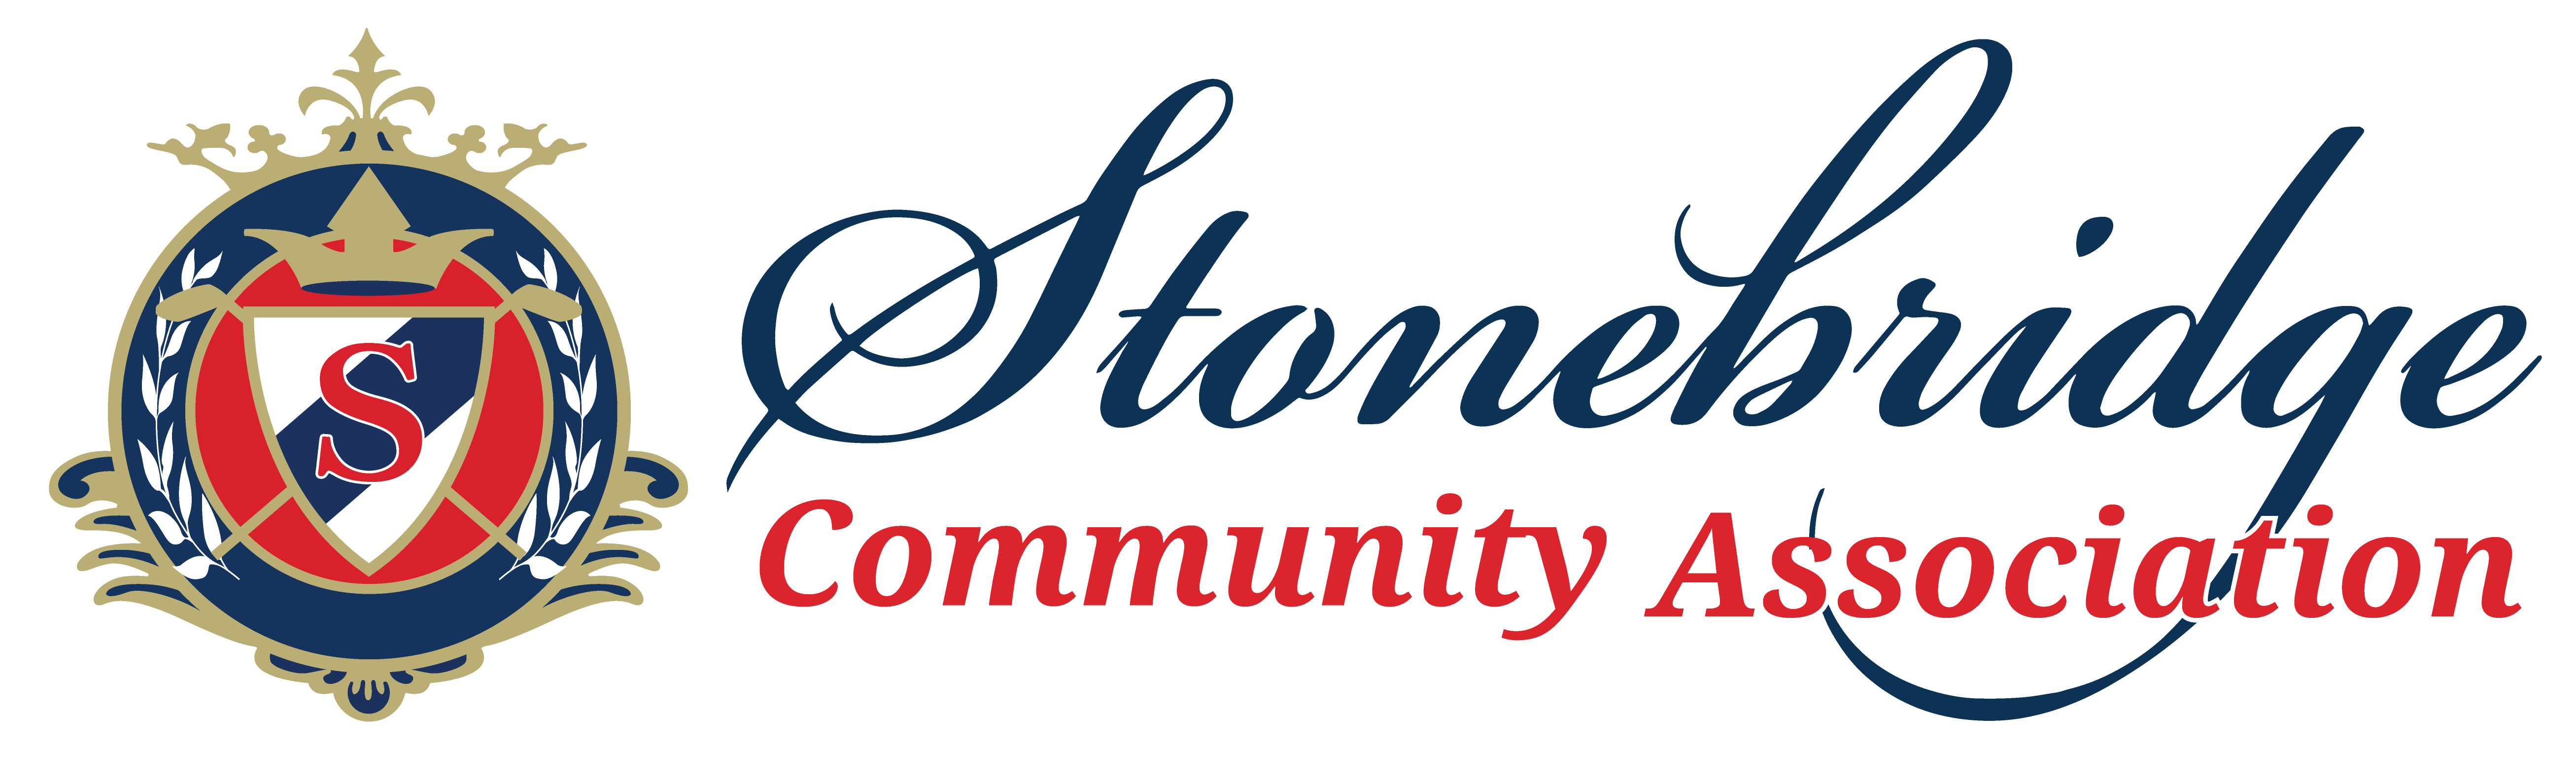 Stonebridge Community Association